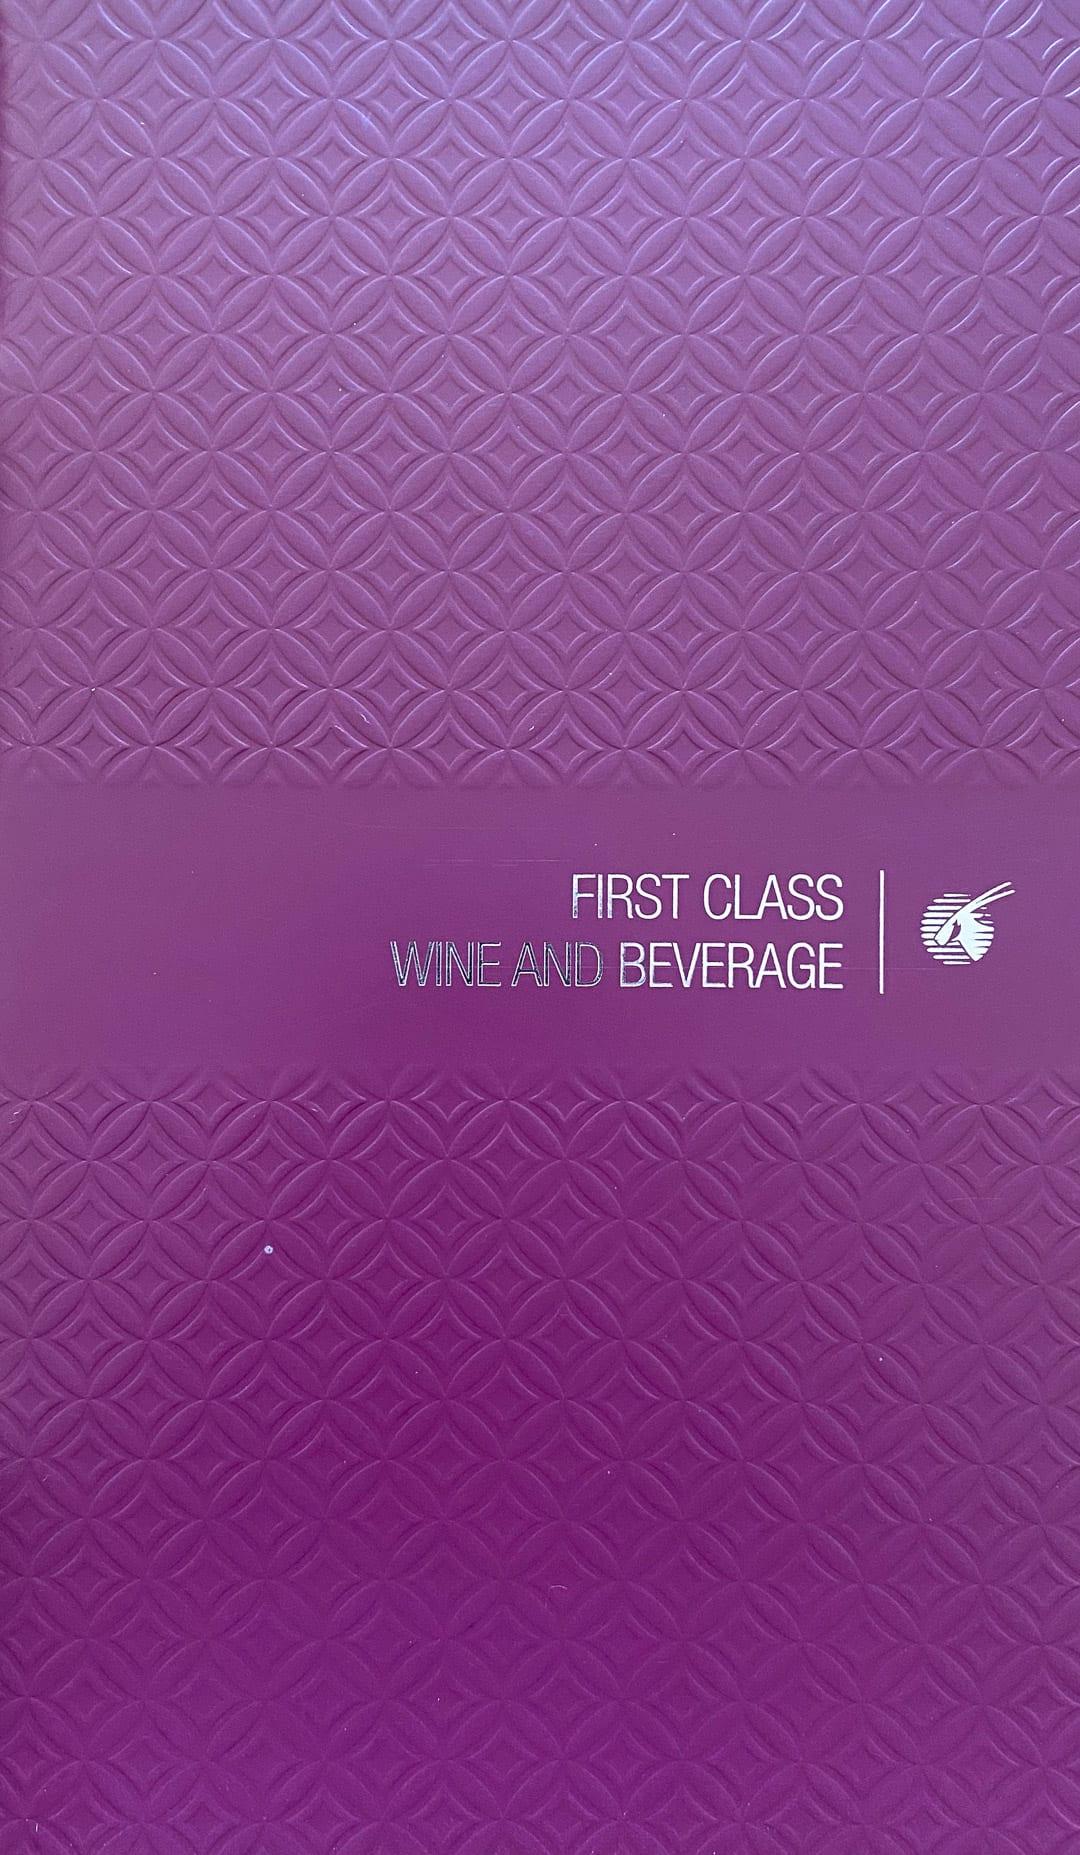 QR F A380 LHR 15 - REVIEW - Qatar Airways : First Class - A380 - Doha (DOH) to London (LHR)